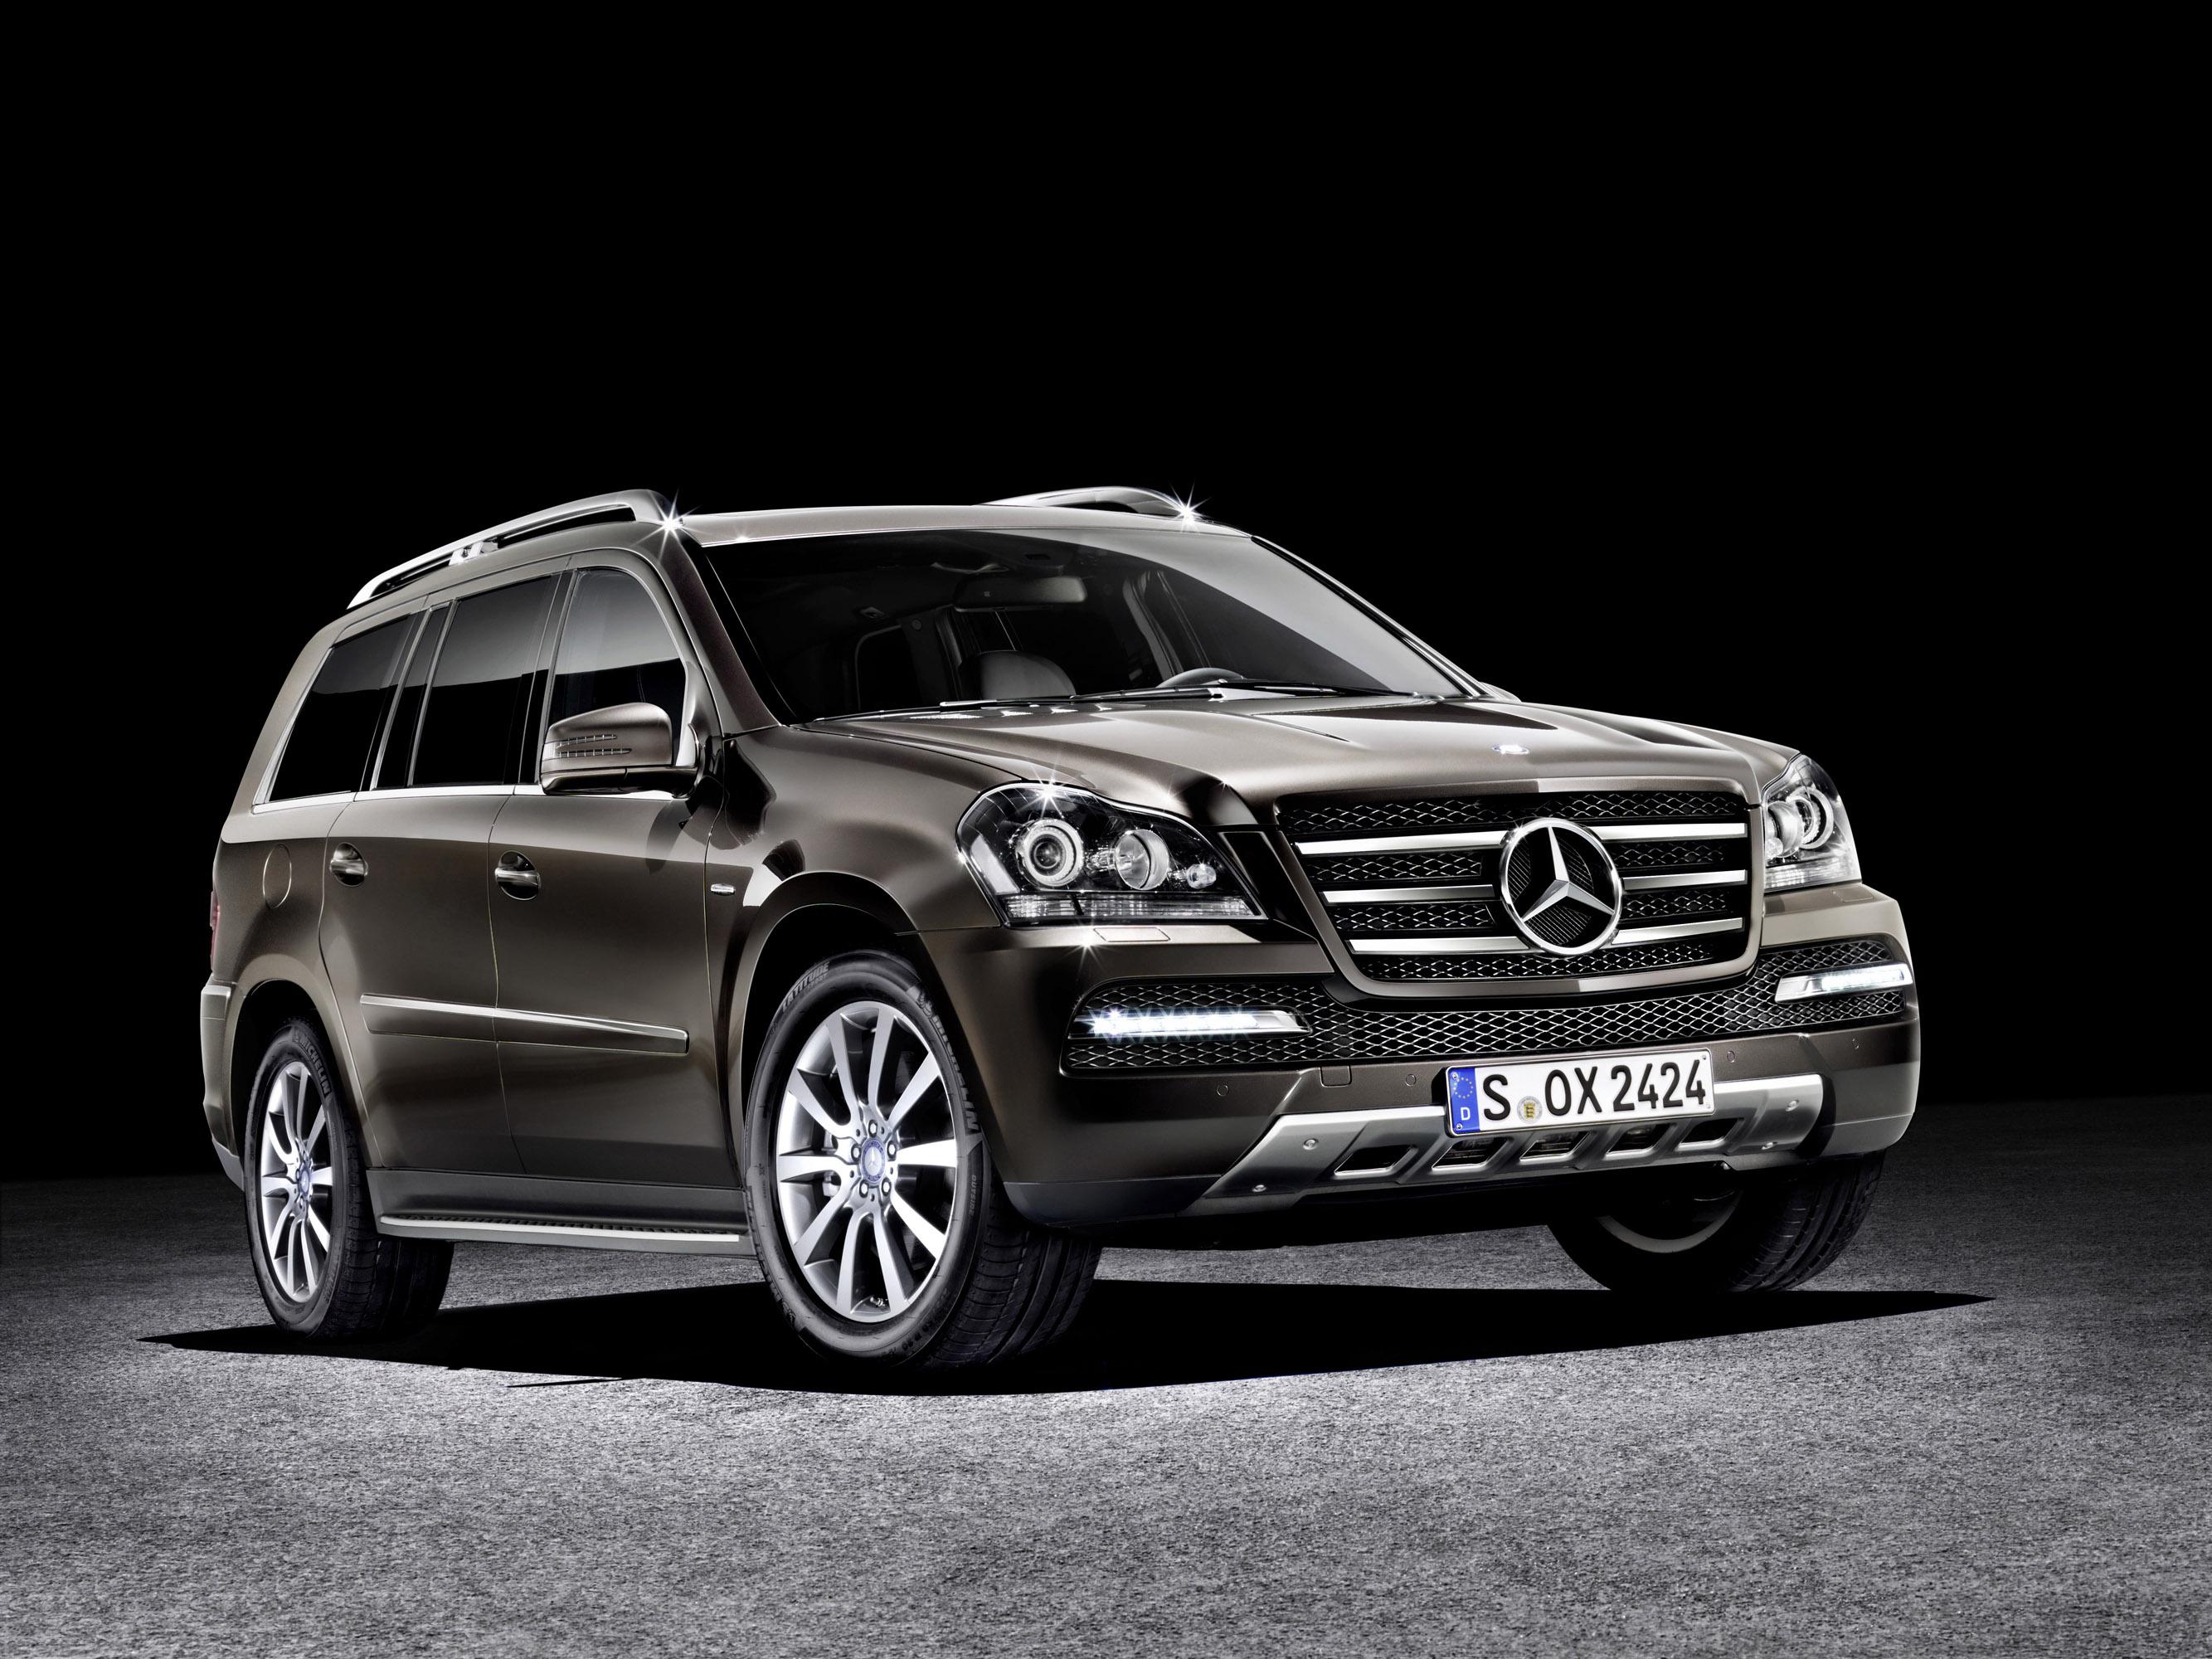 Mercedes-Benz GL-Class Grand Edition photo #1